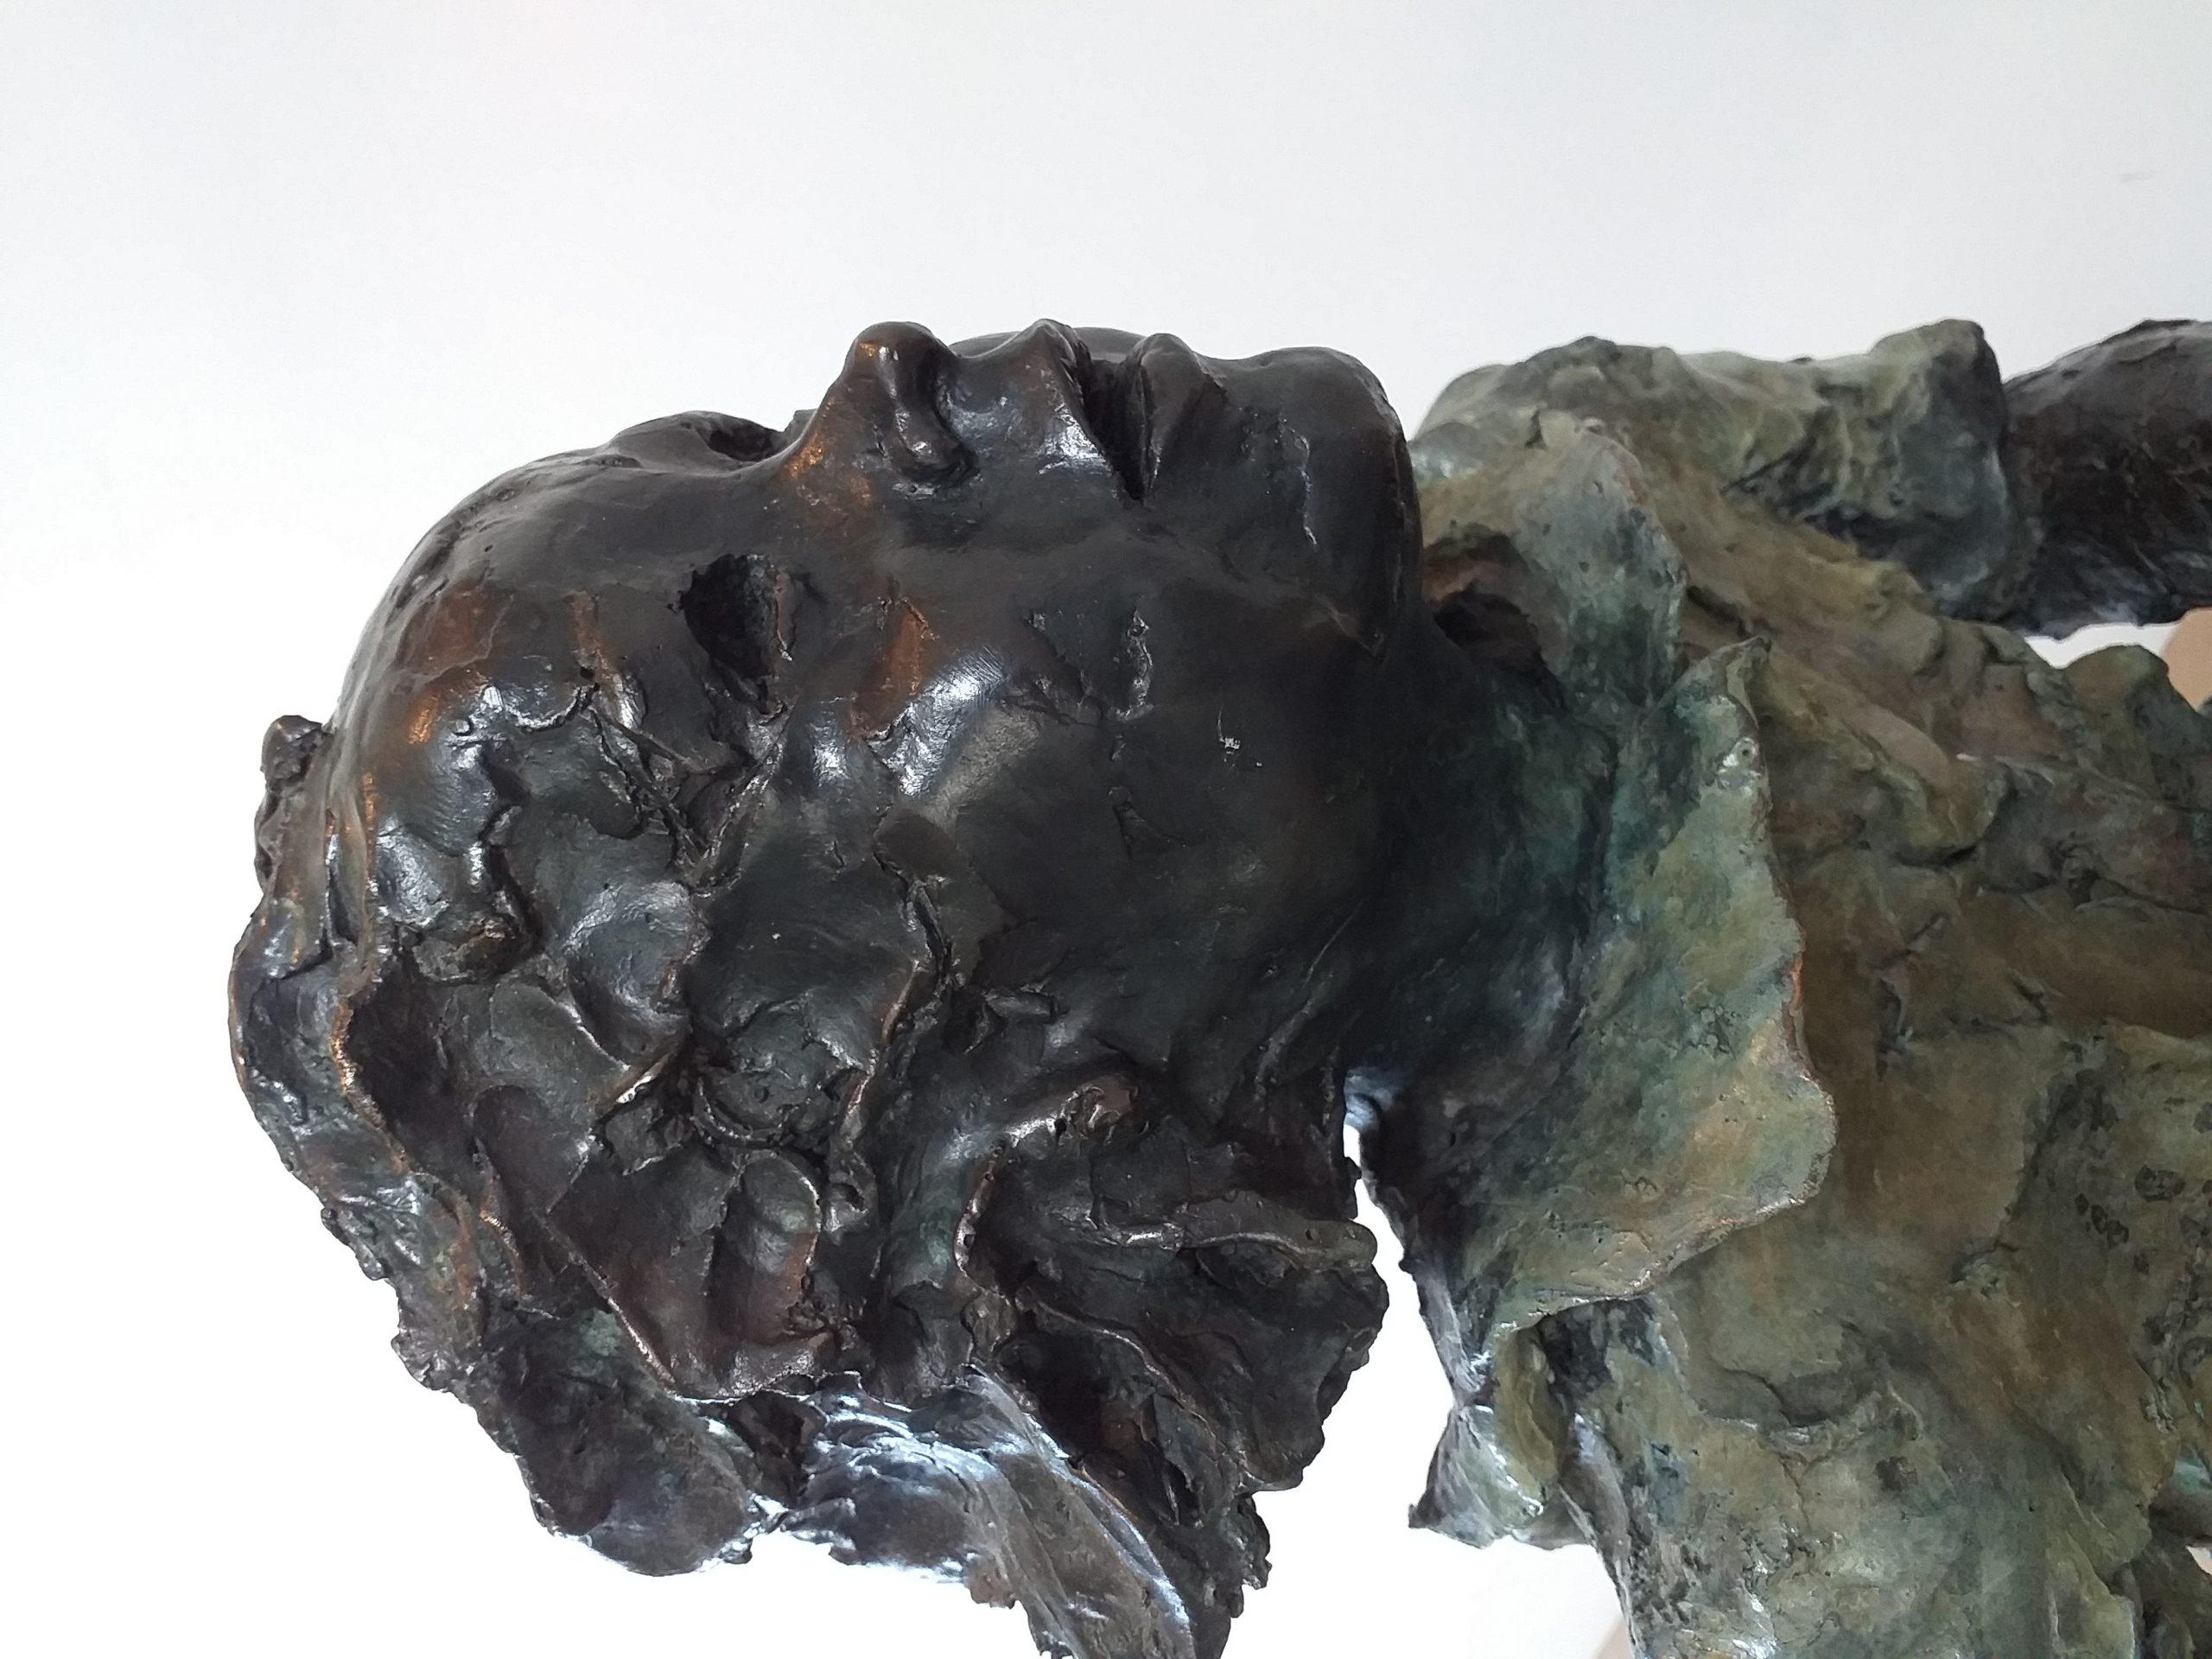 Sculpture Martine Kerbaole Filette en robe qui court